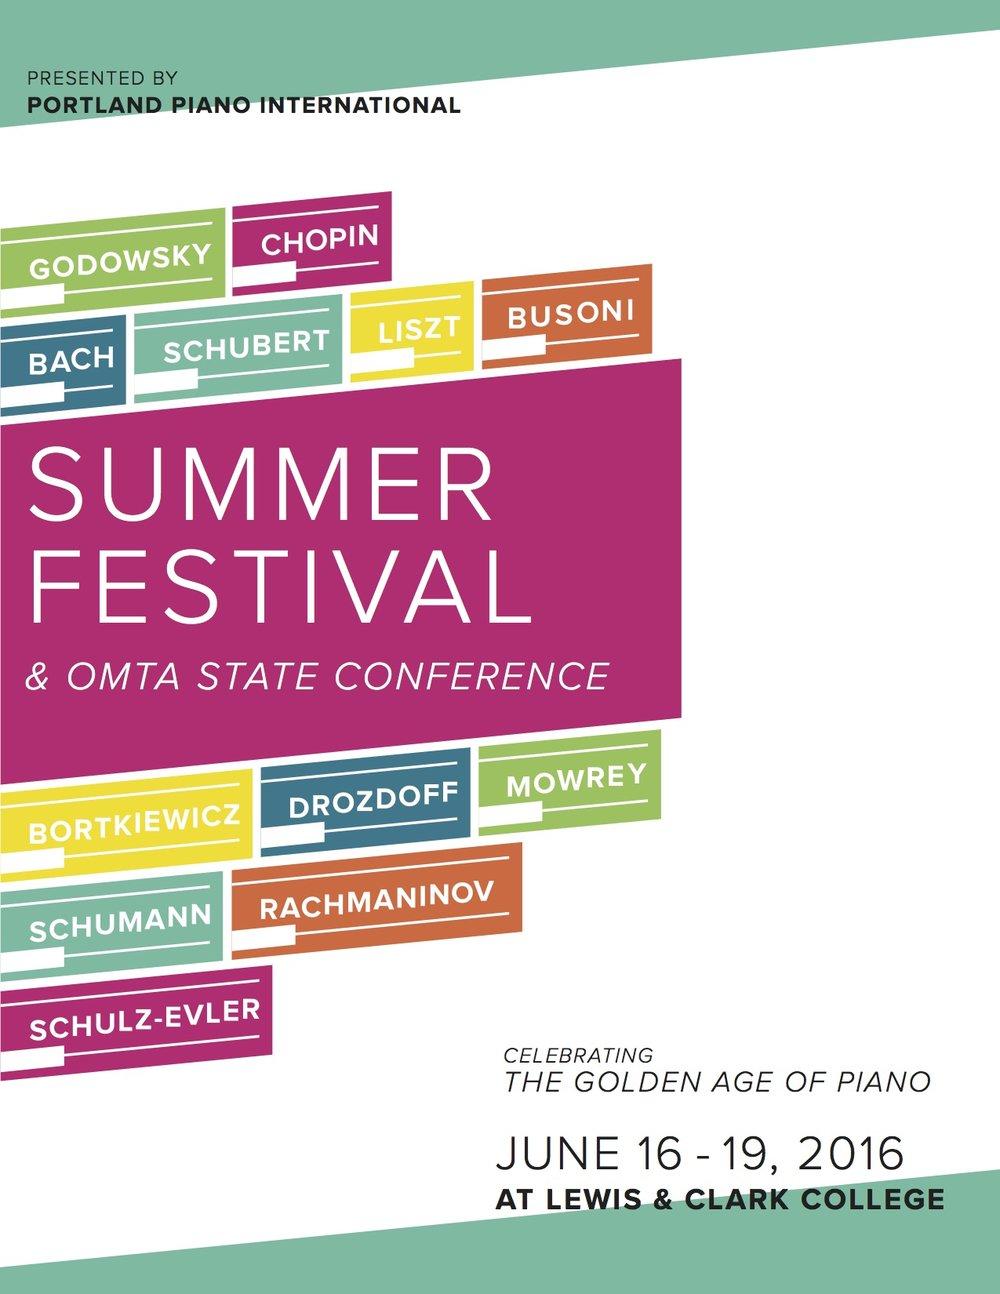 SummerFestival_1.jpg